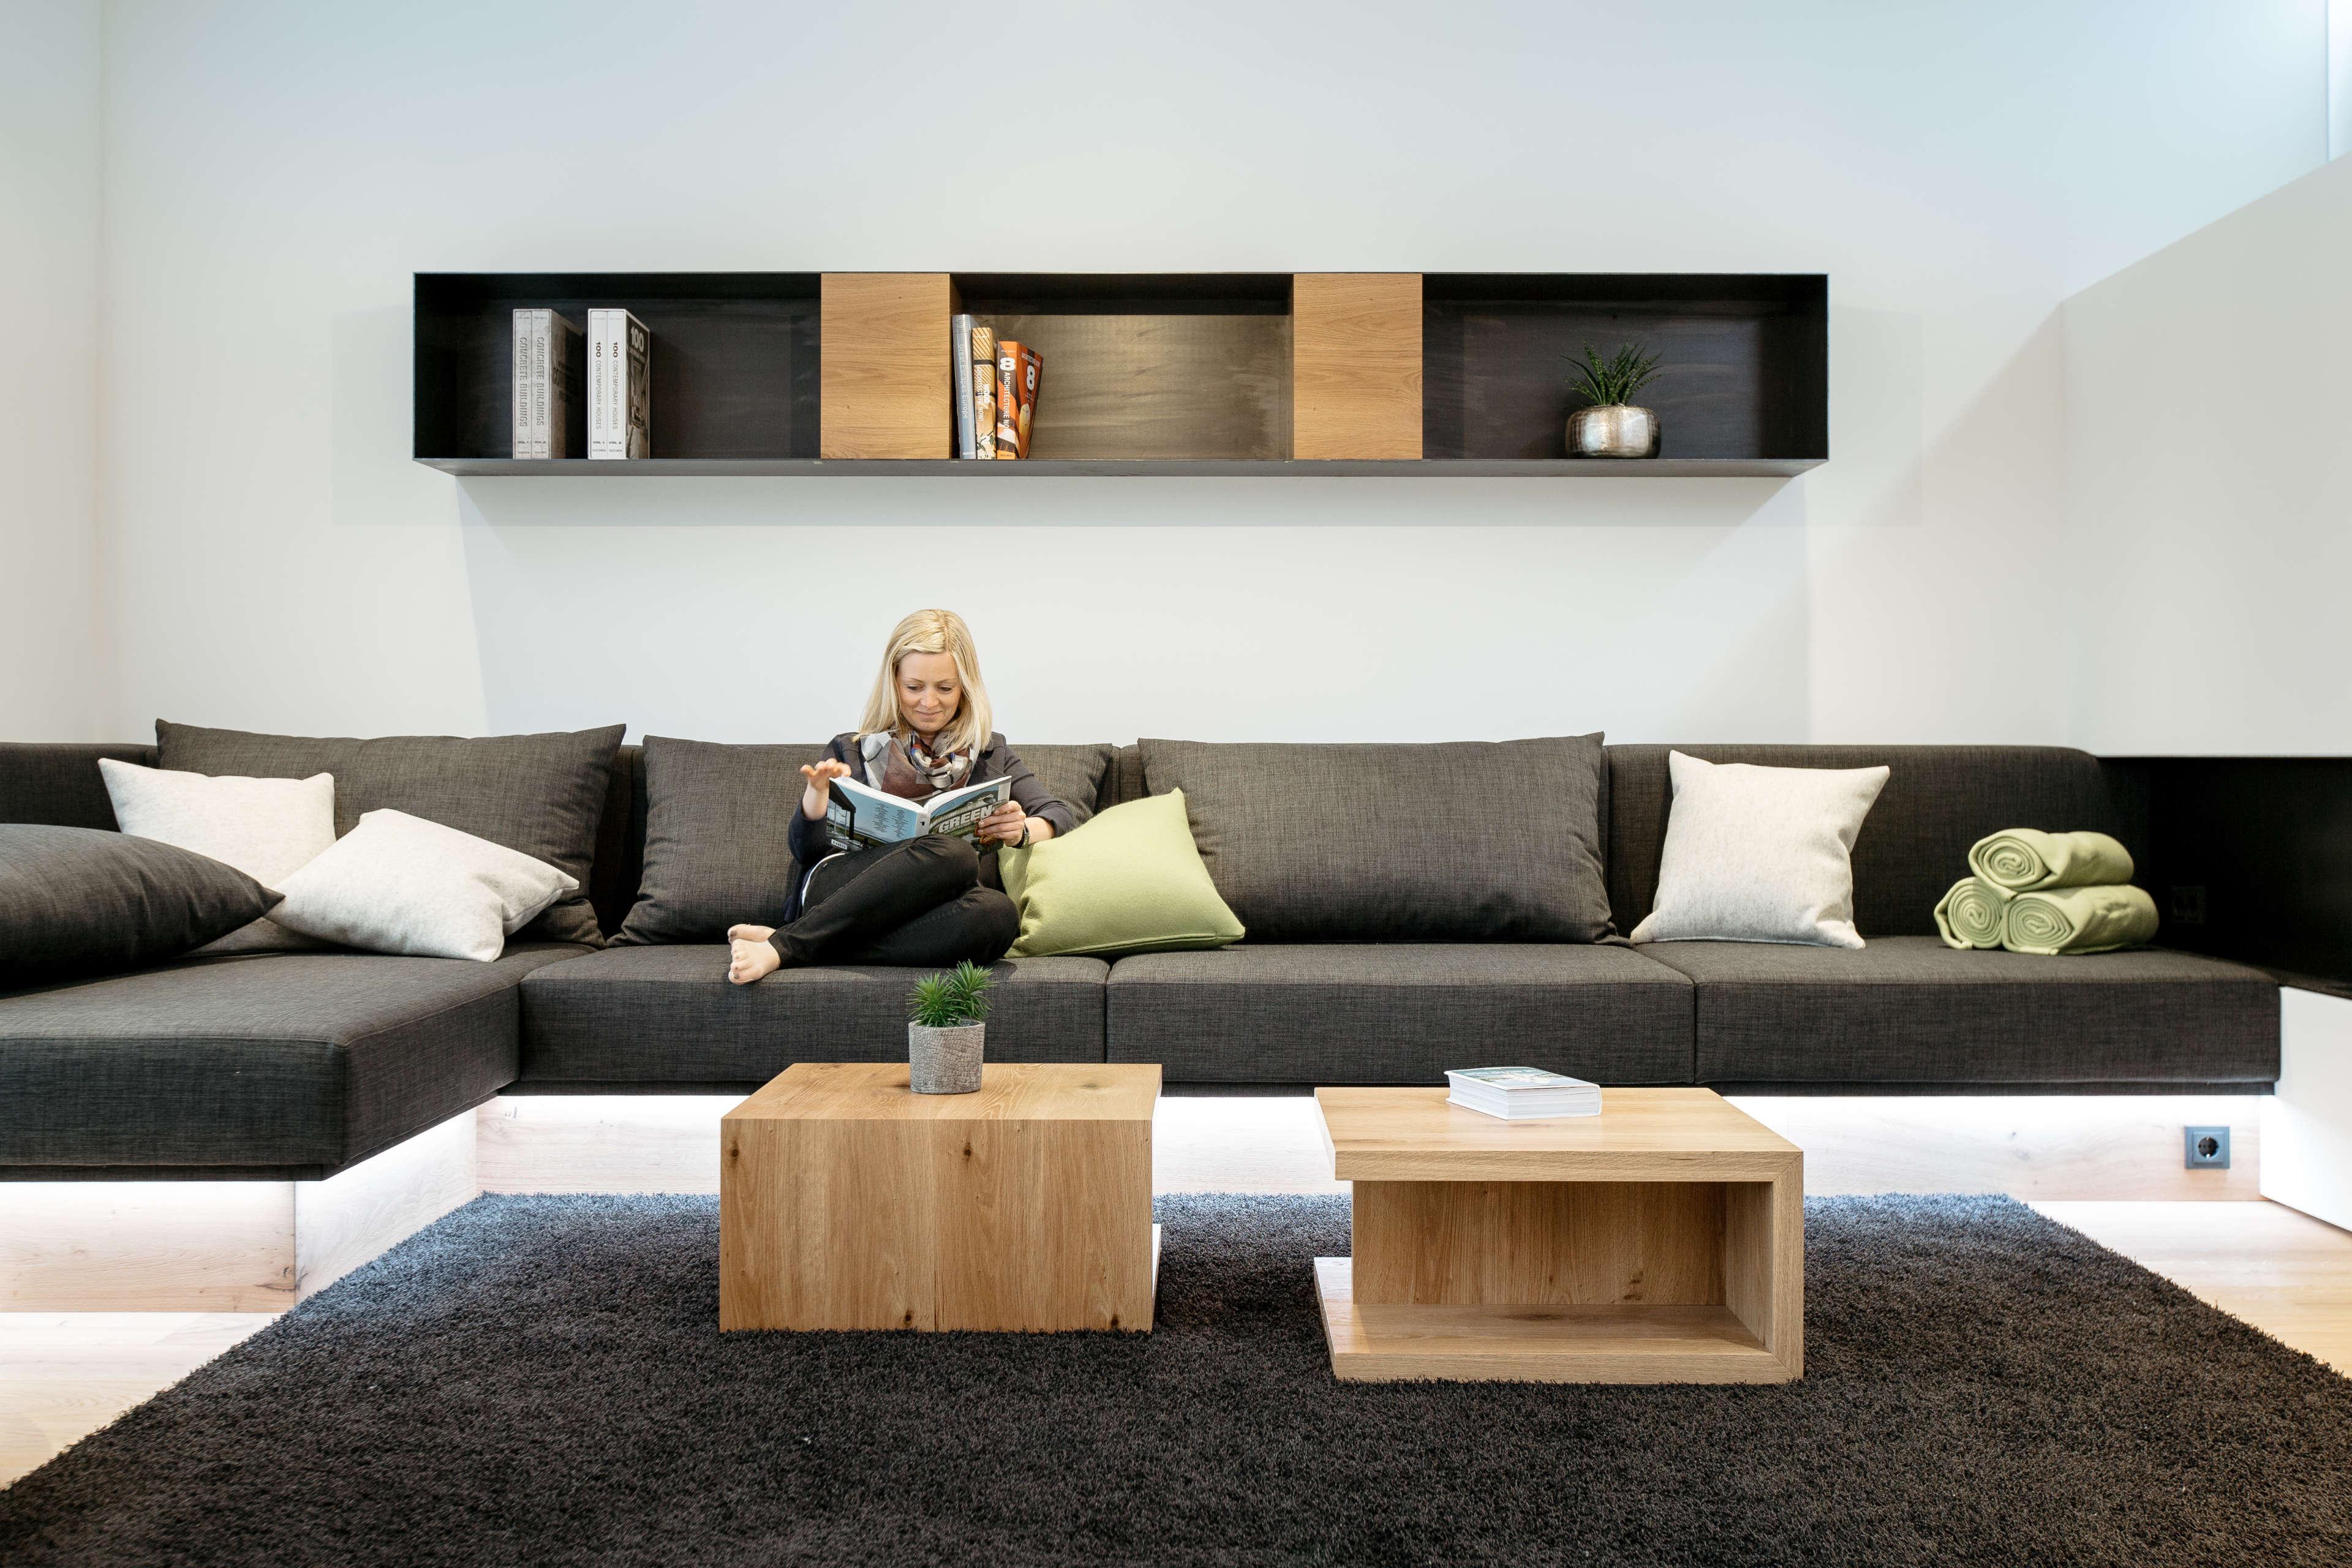 elektrotec qualit t service elektroinstallateur. Black Bedroom Furniture Sets. Home Design Ideas